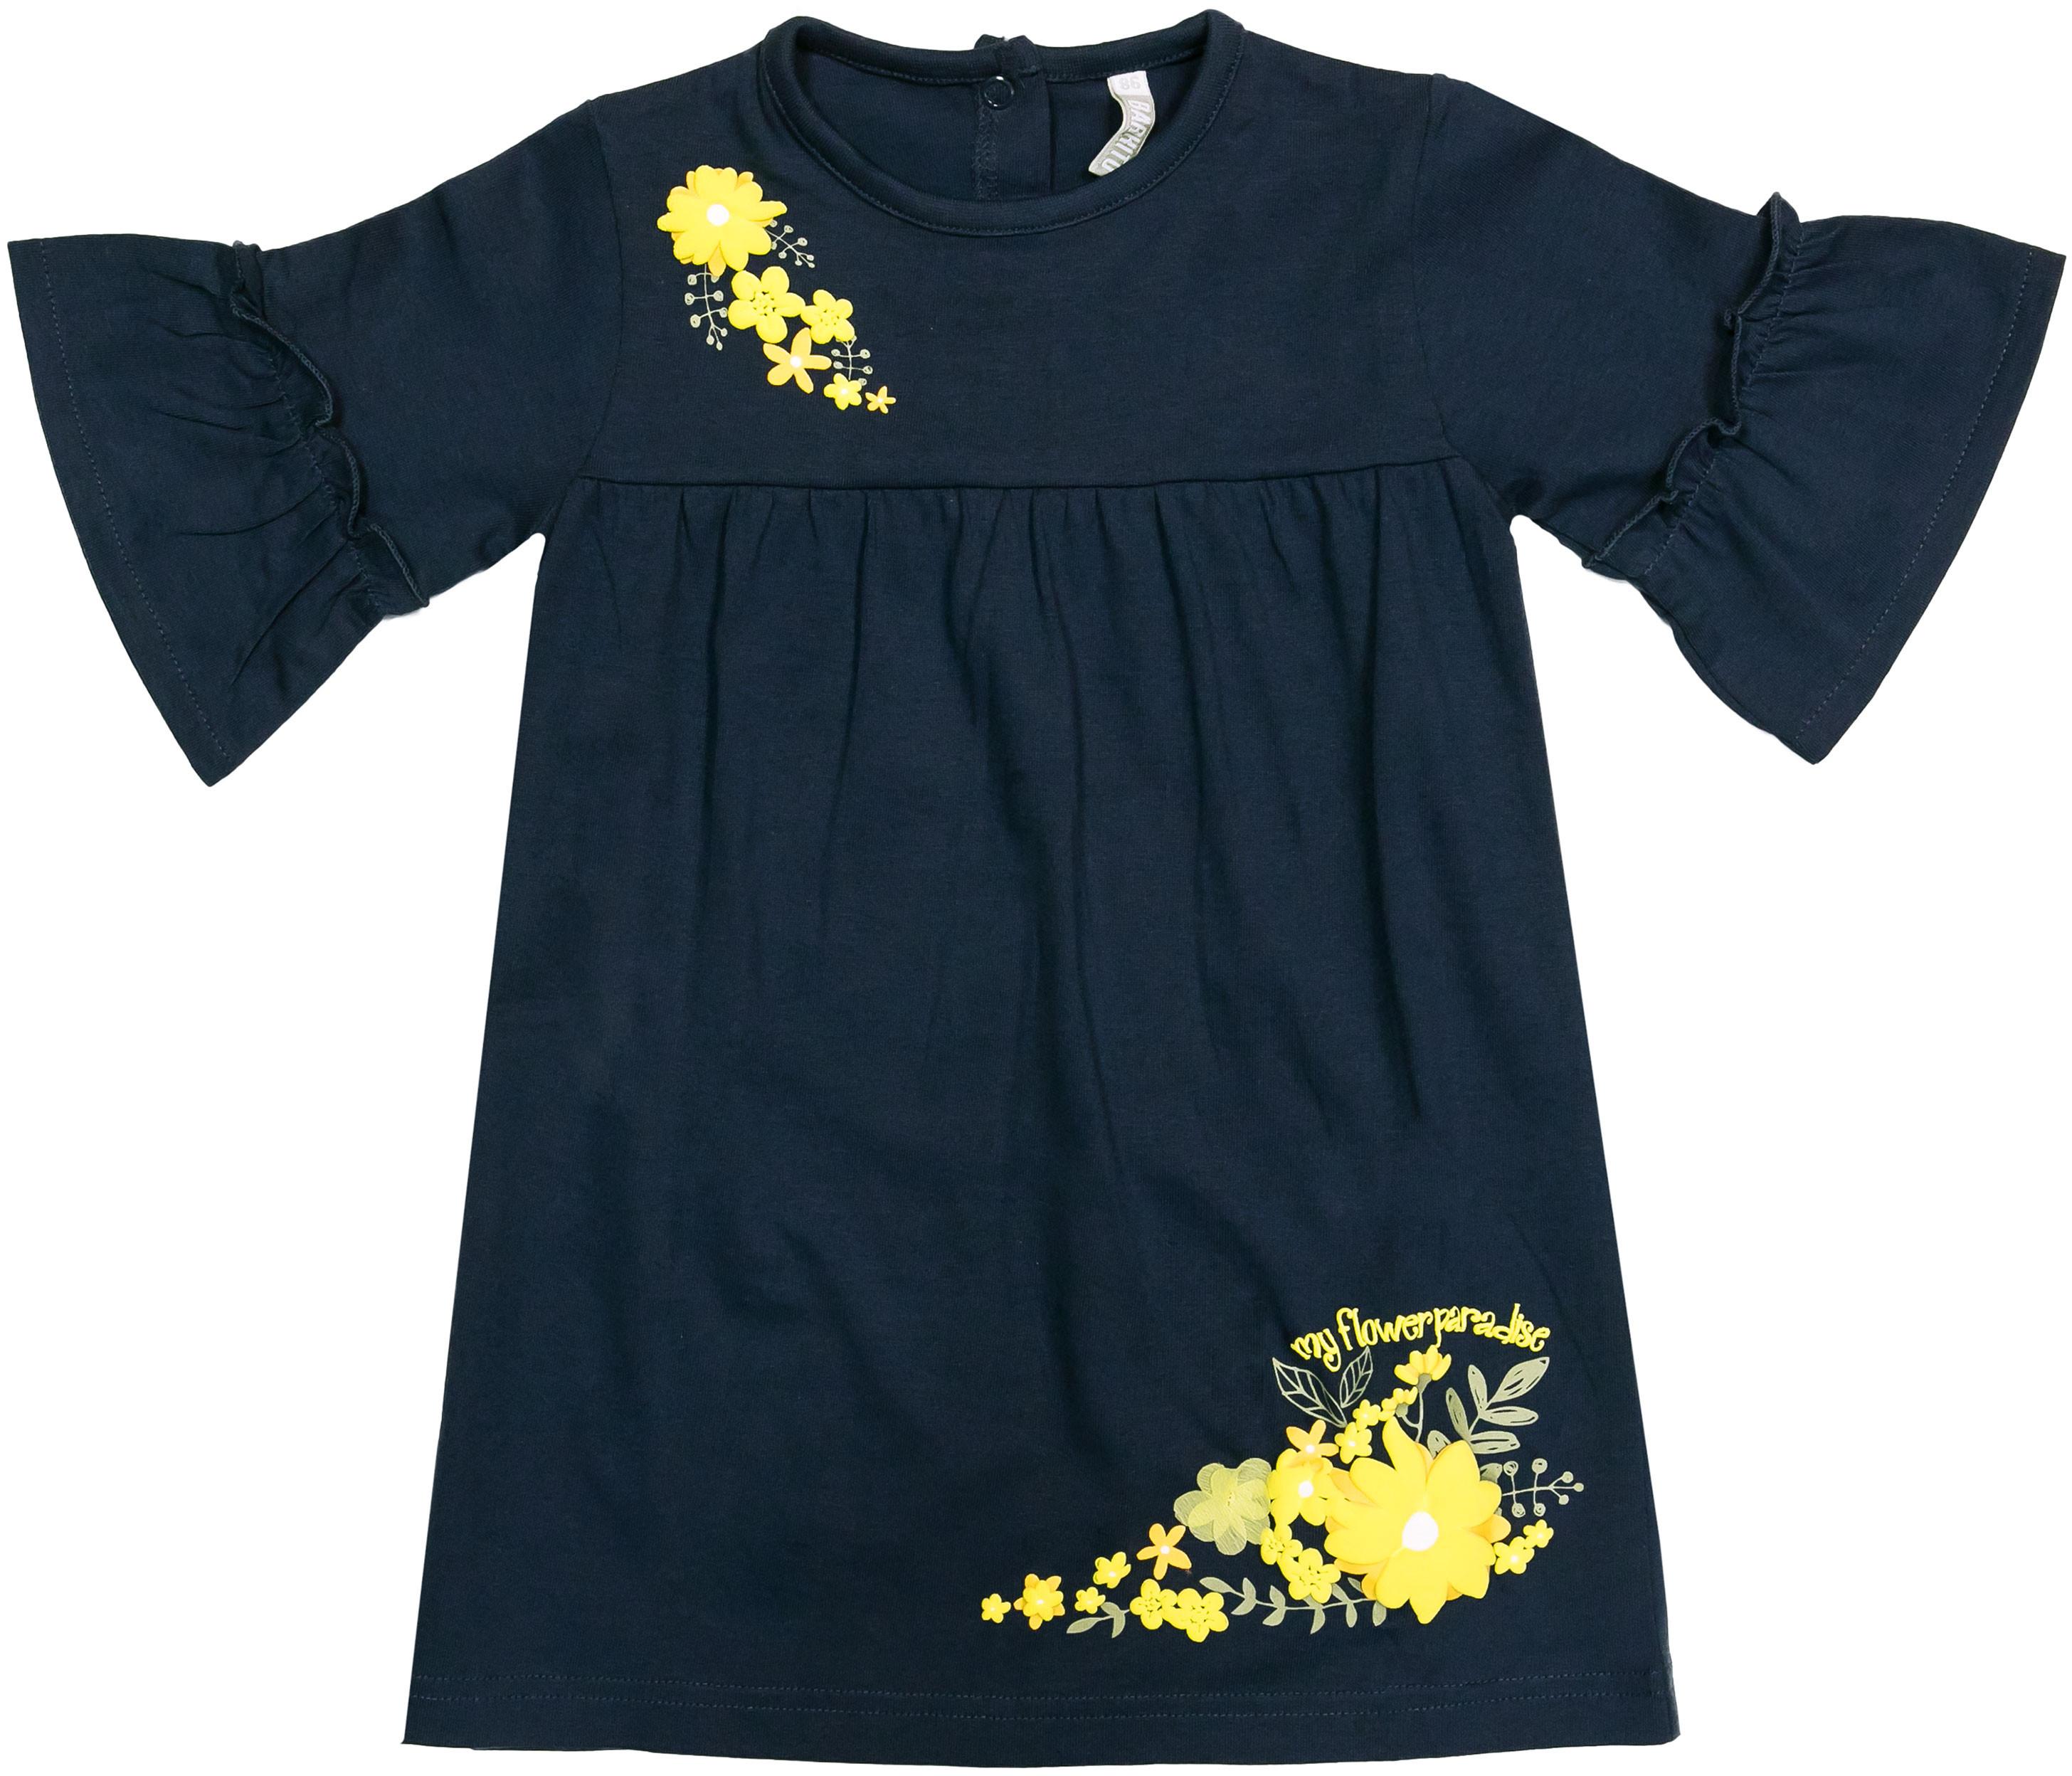 Платья Barkito Платье детское Barkito Желтые цветы, темно-синее платье lussotico lussotico mp002xw13lz5